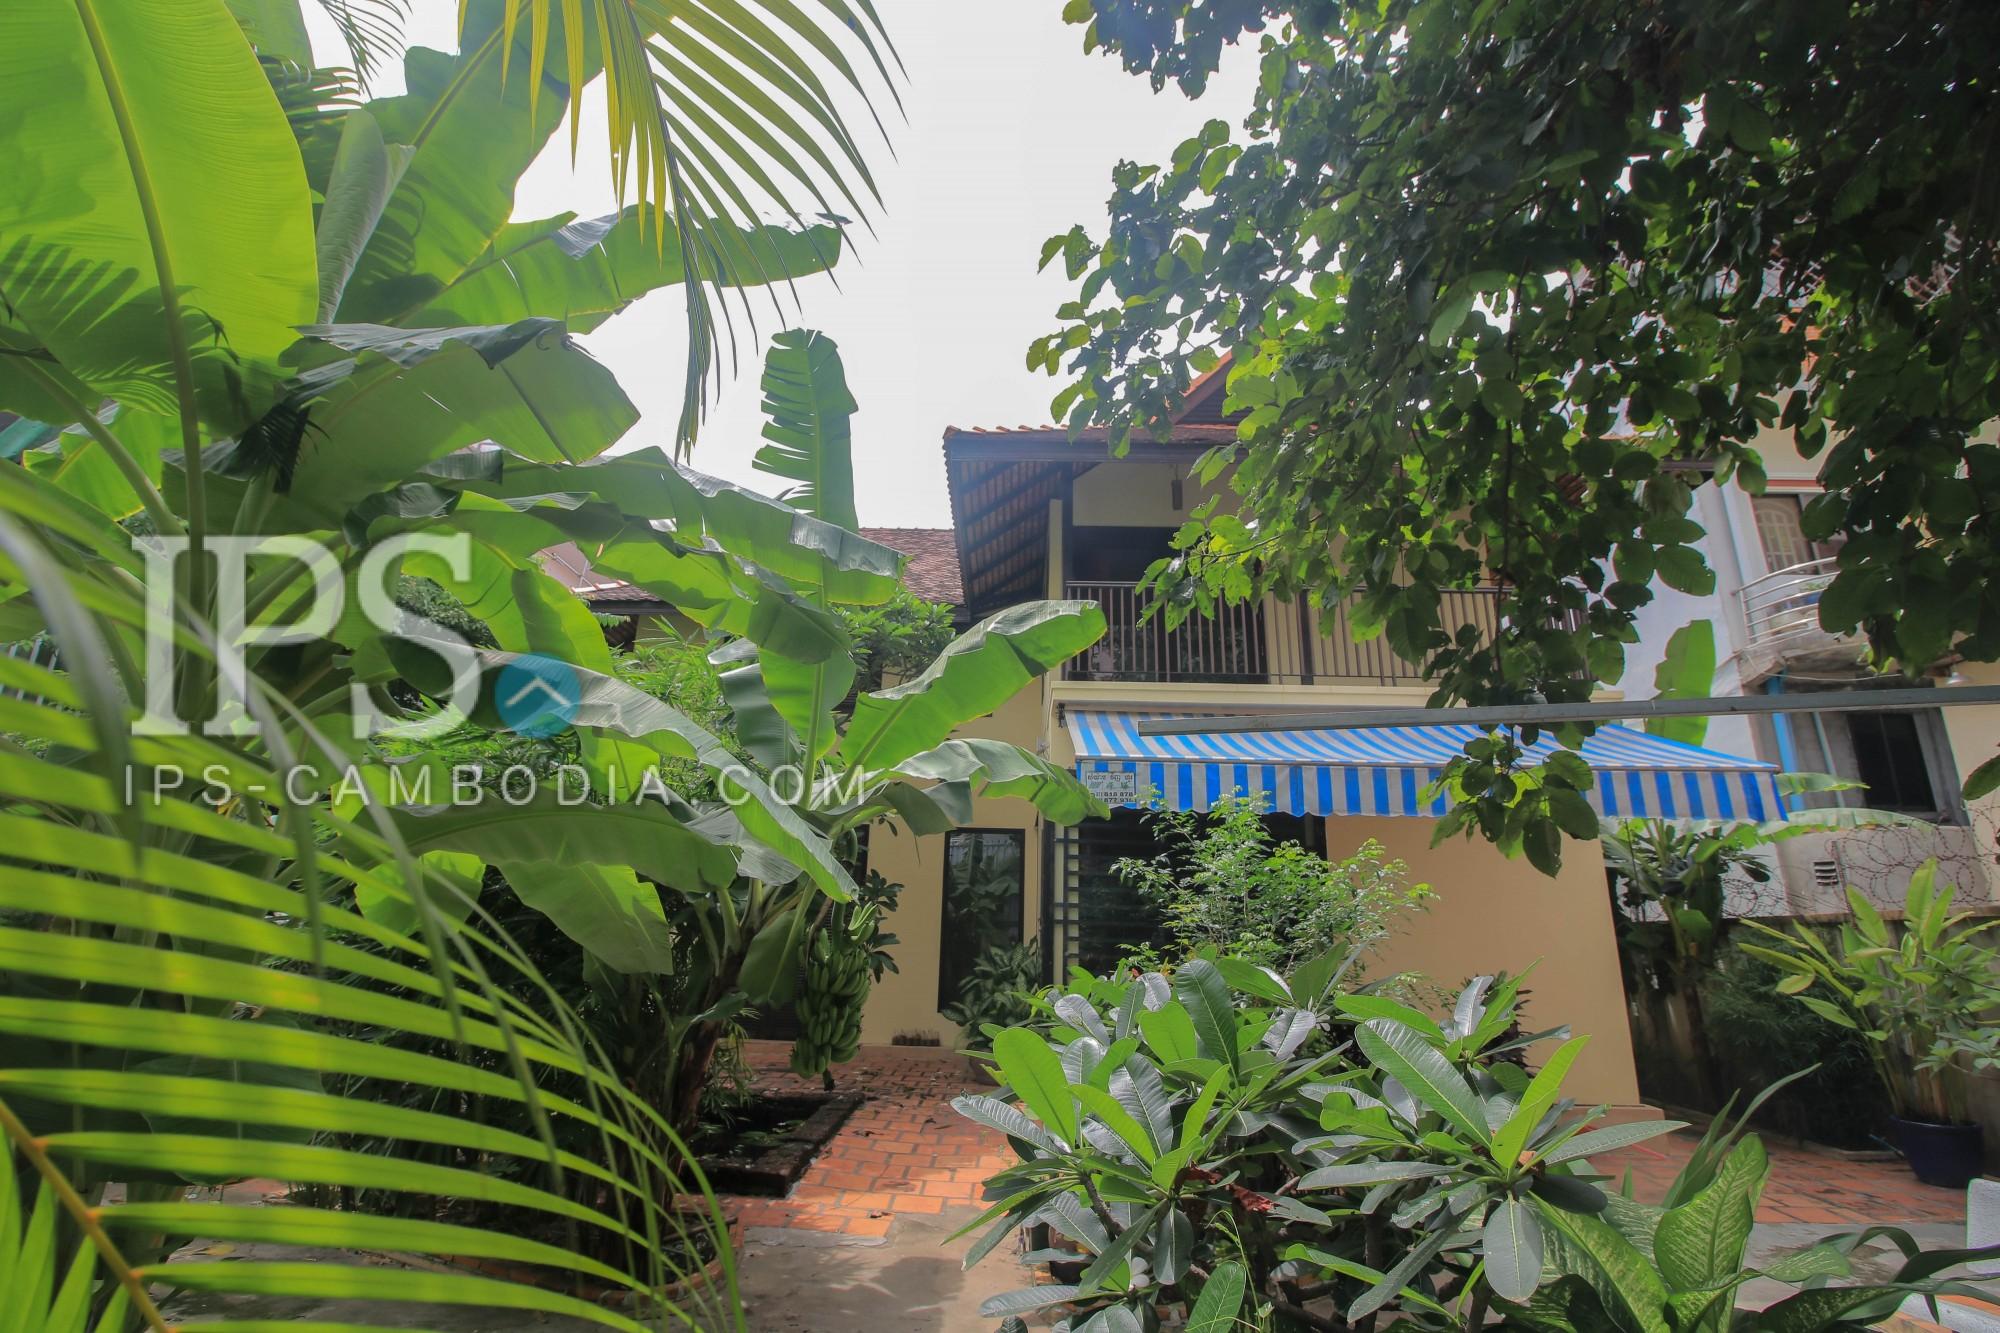 4 Bedrooms Villa  For Rent - Boeung Tumpun, Phnom Penh